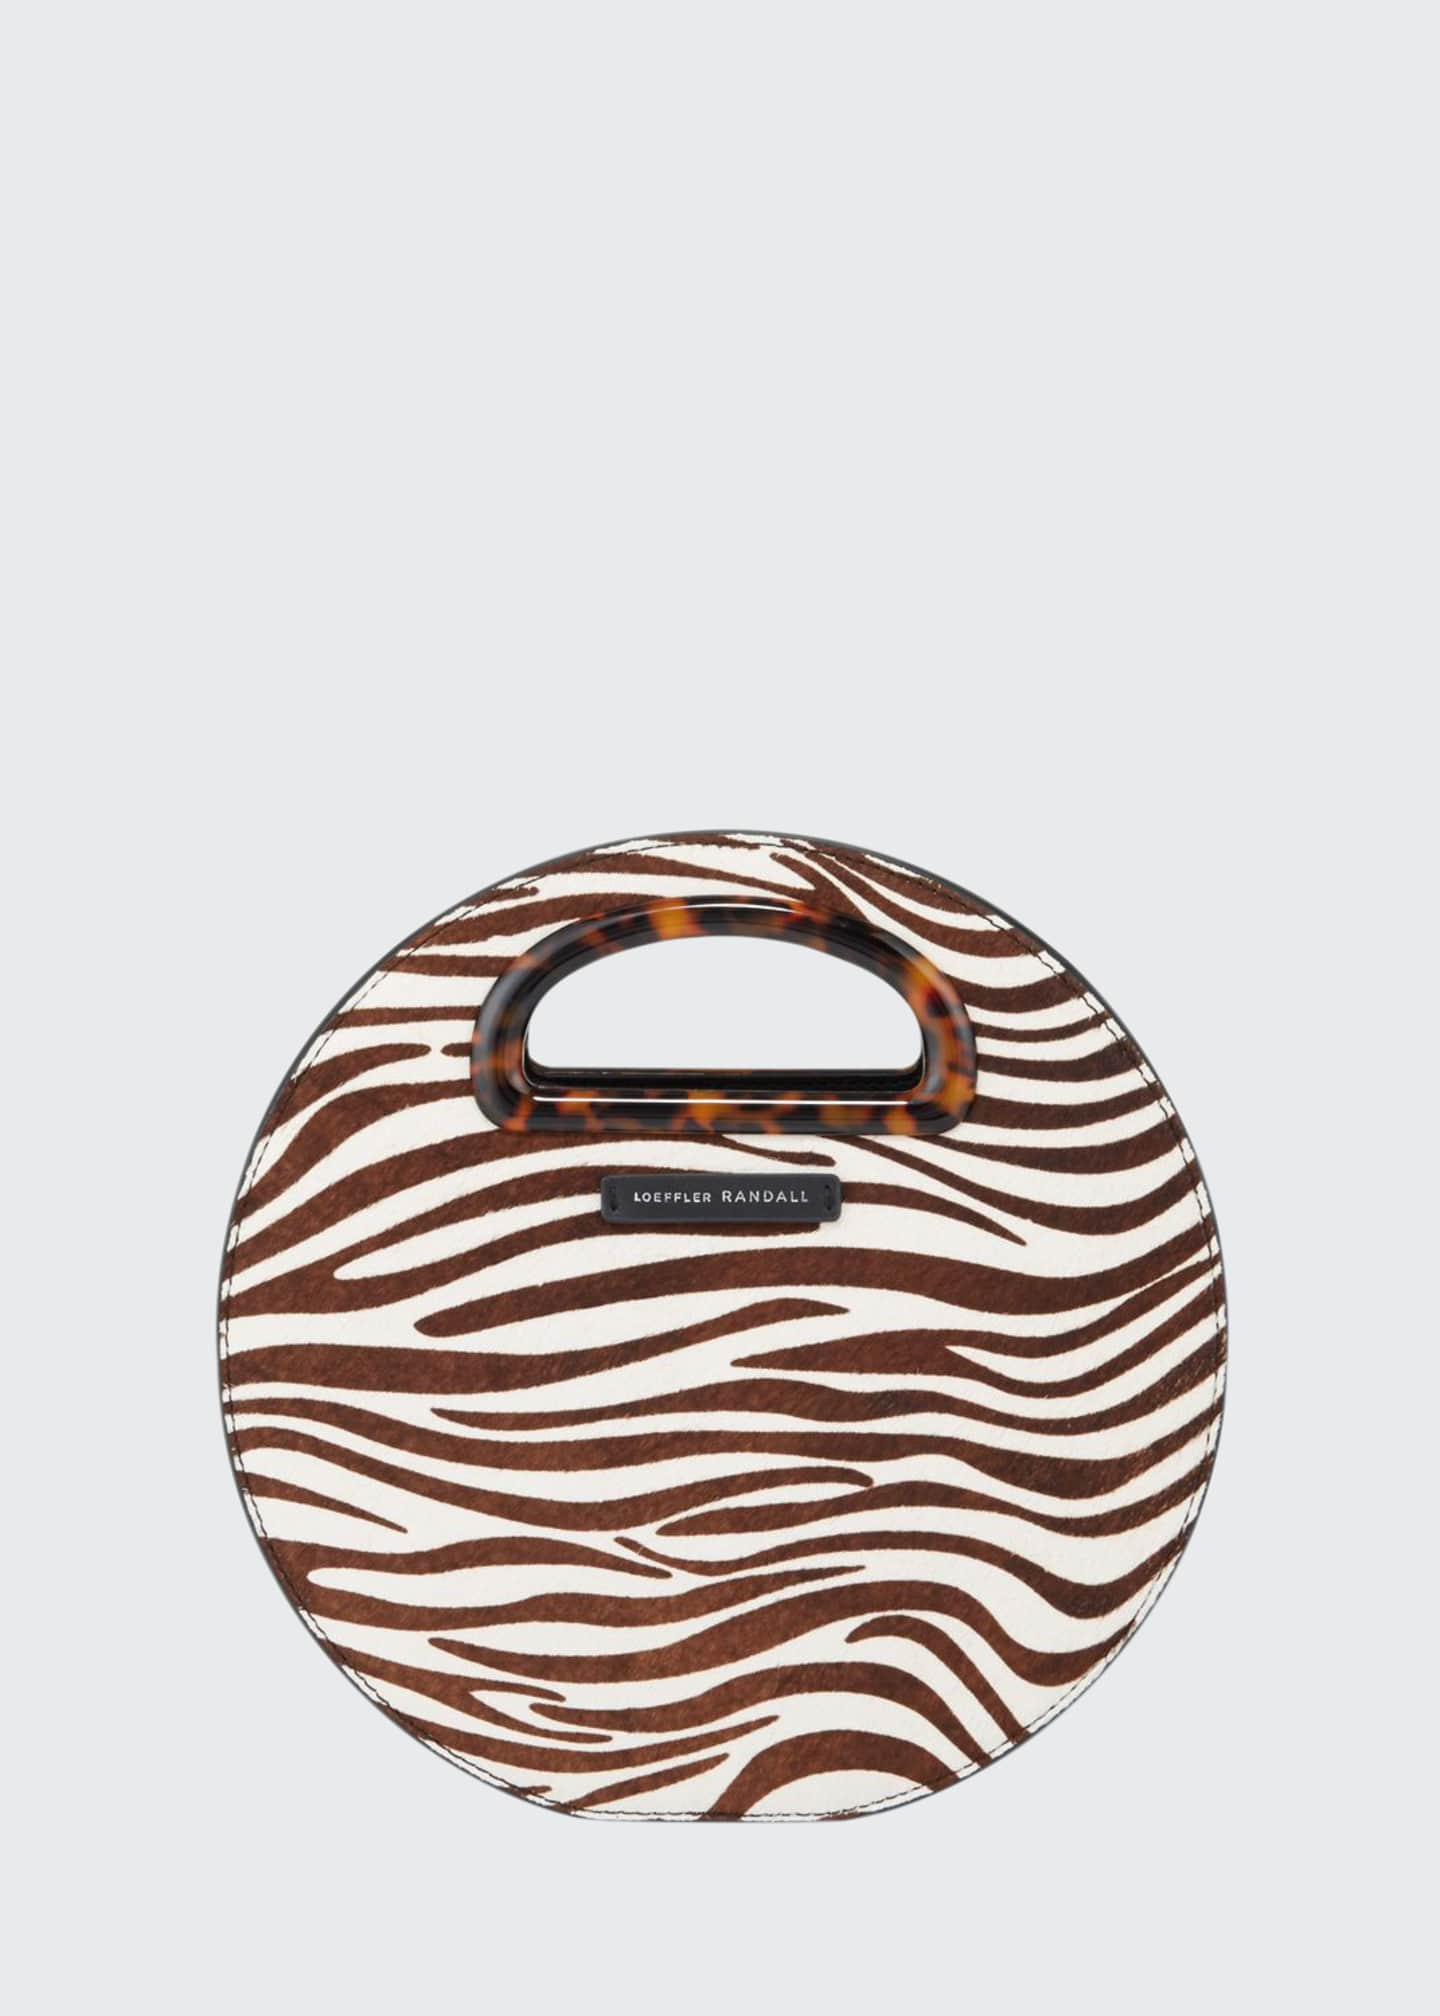 Loeffler Randall Calf Hair Indy Circle Crossbody Bag